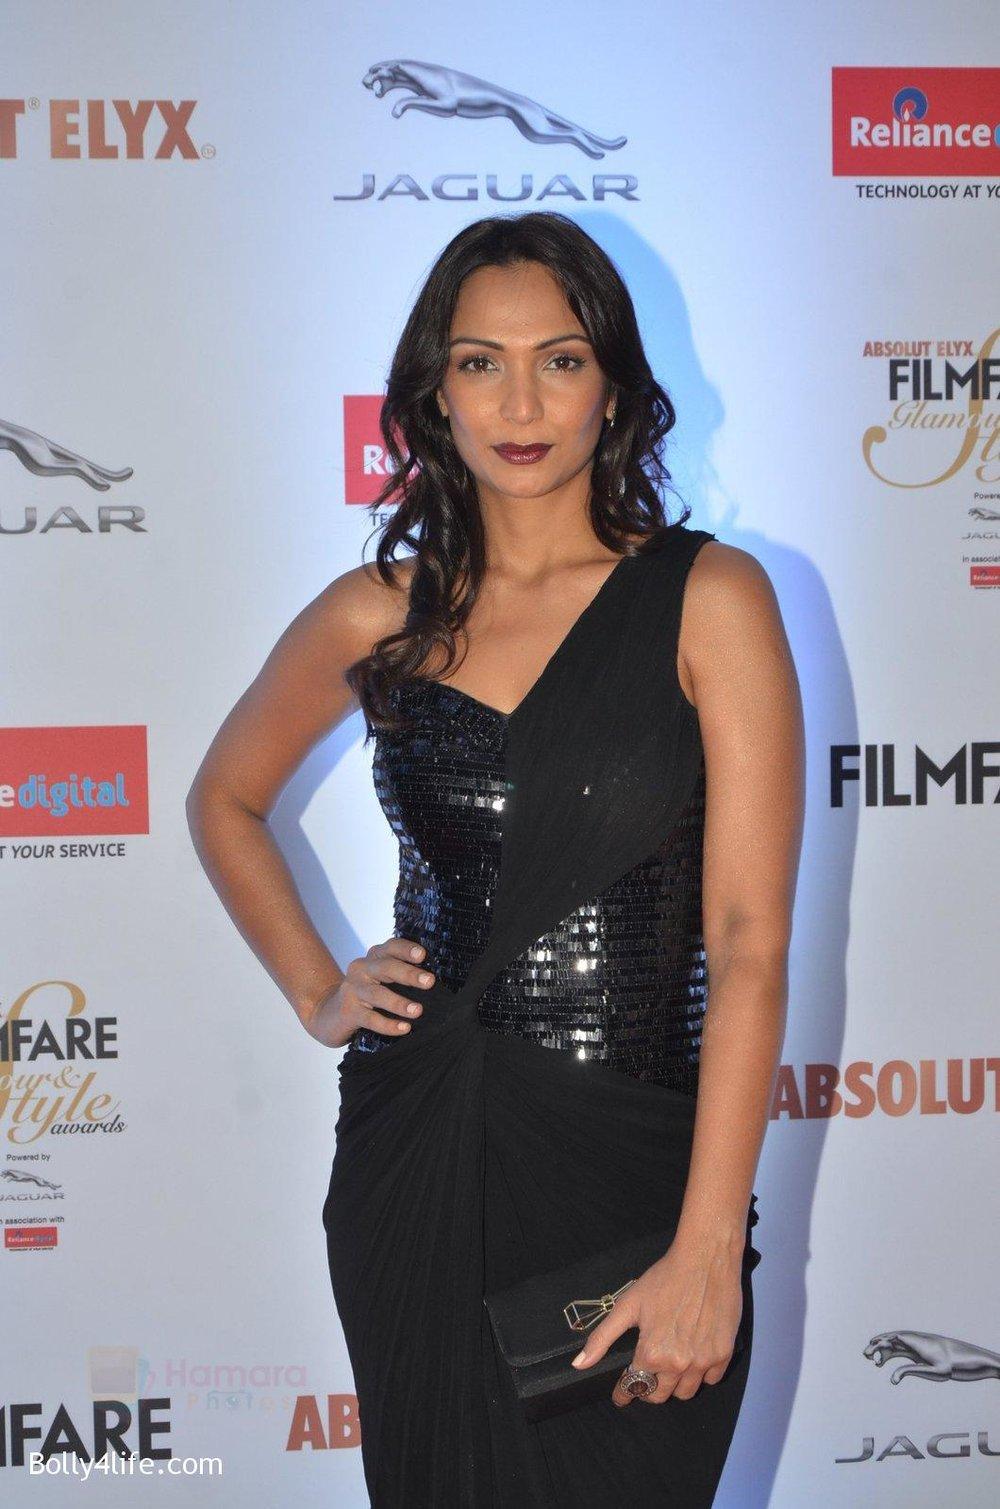 Shamita-Singha-at-Filmfare-Glamour-Style-Awards-2016-in-Mumbai-on-15th-Oct-2016-1127.jpg